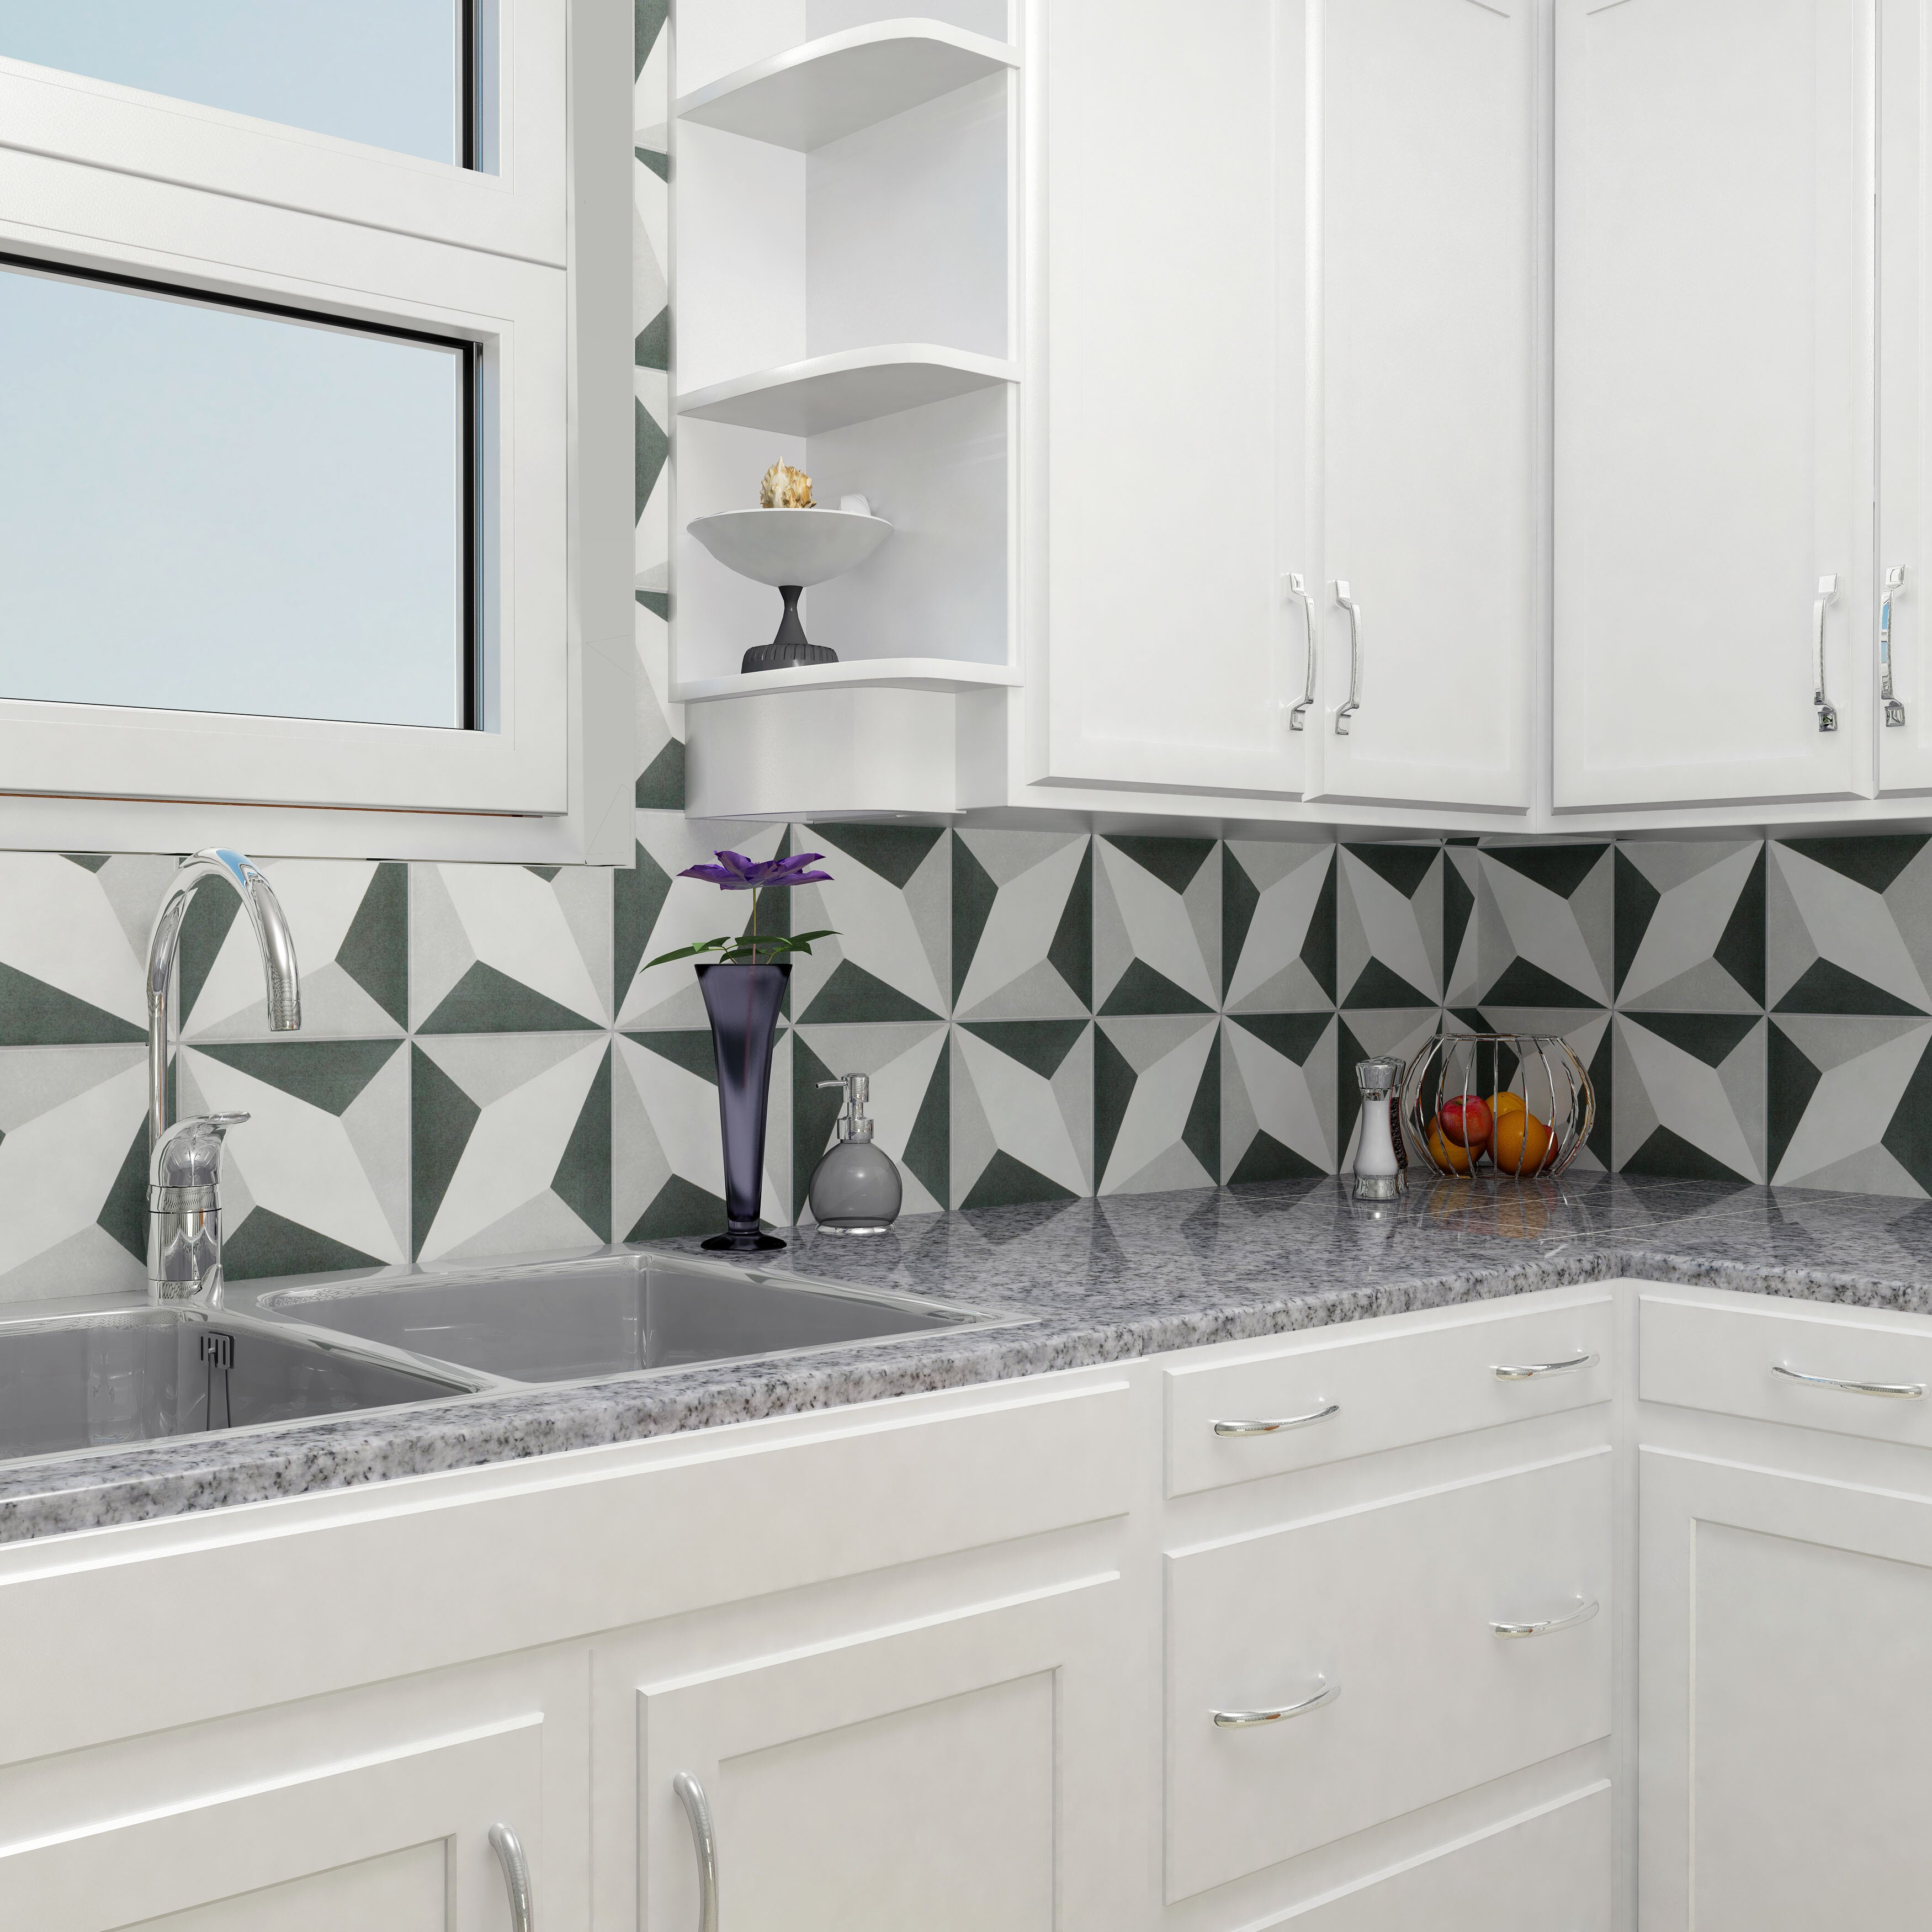 Elitetile Forties 7 75 Quot X 7 75 Quot Ceramic Floor And Wall